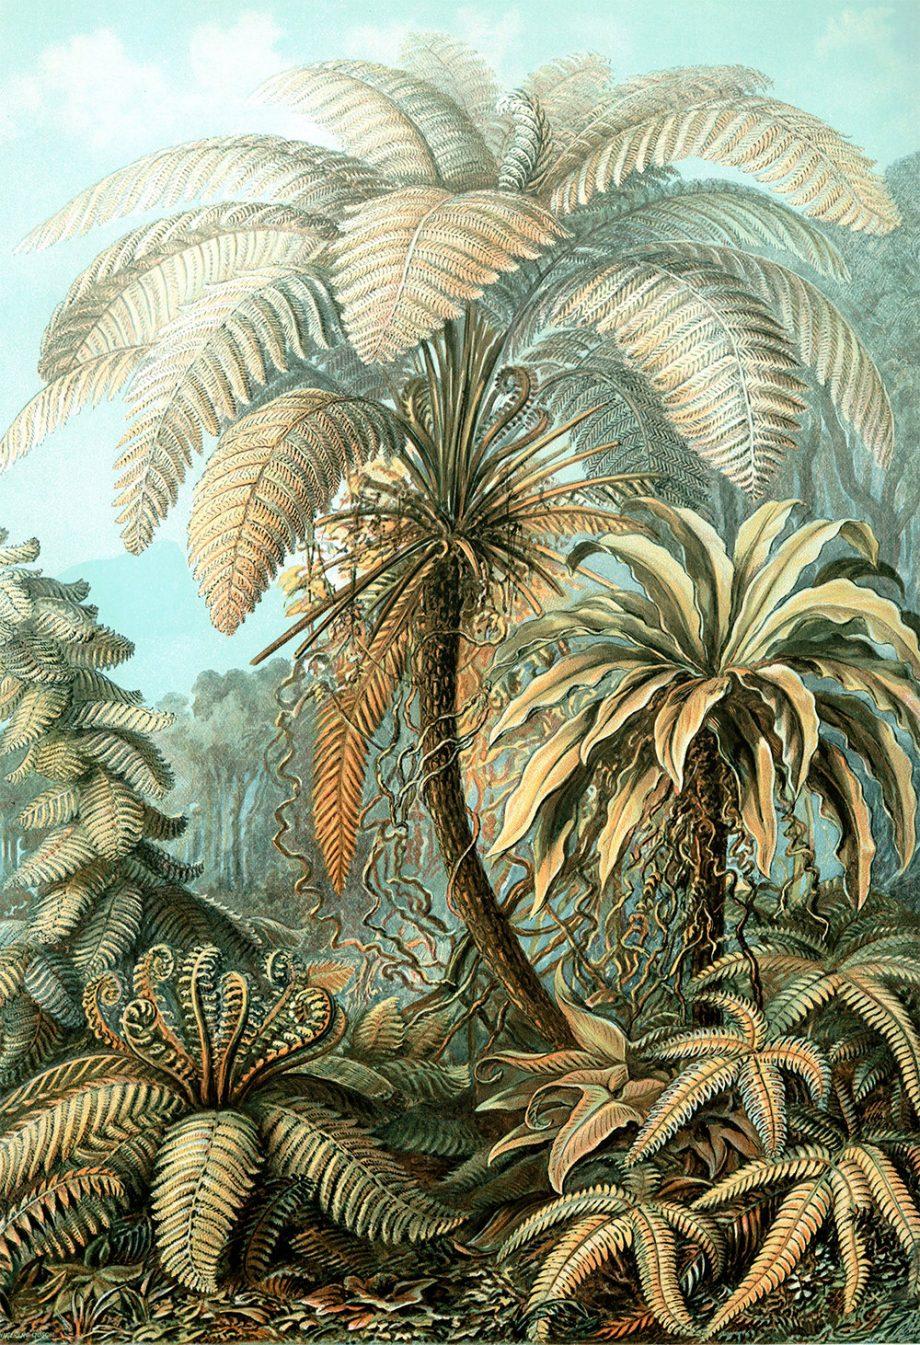 Ernst Haeckel Filicinae Print Tropical Art Vintage Decor Ocean Wall Art - Giclee Print on Canvas & Satin